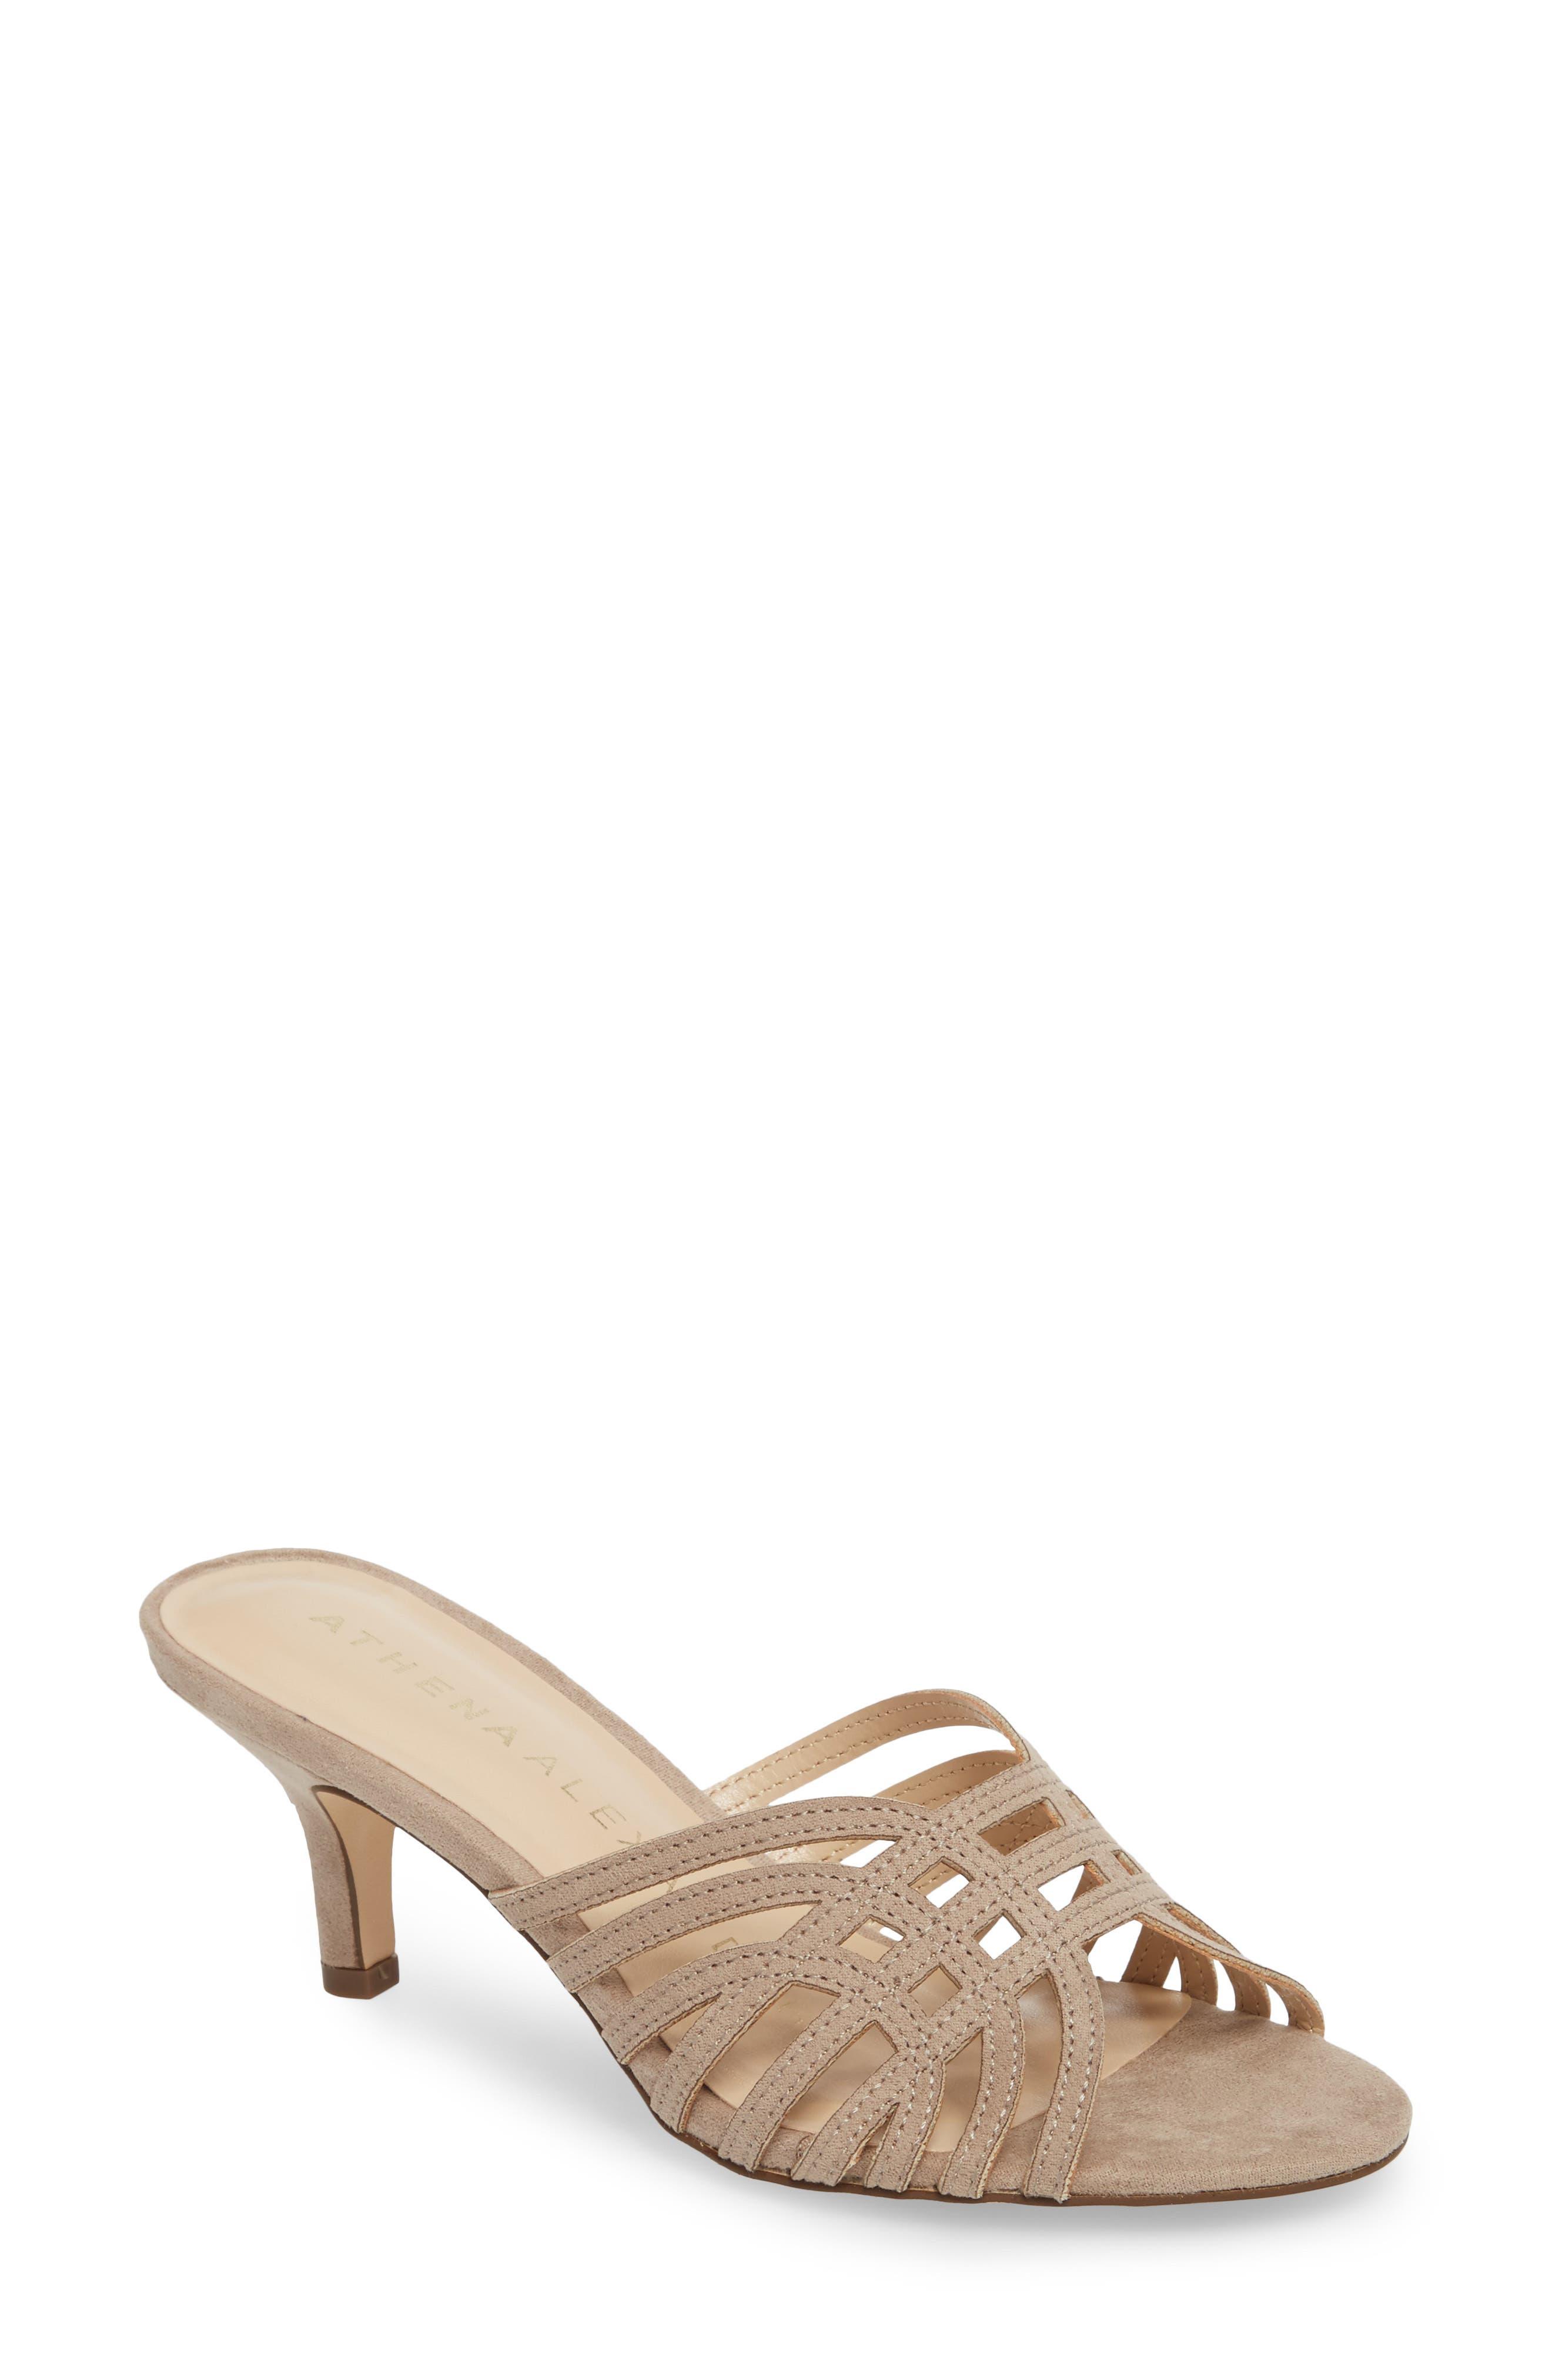 Athena Alexander Cece Cutout Sandal, Beige